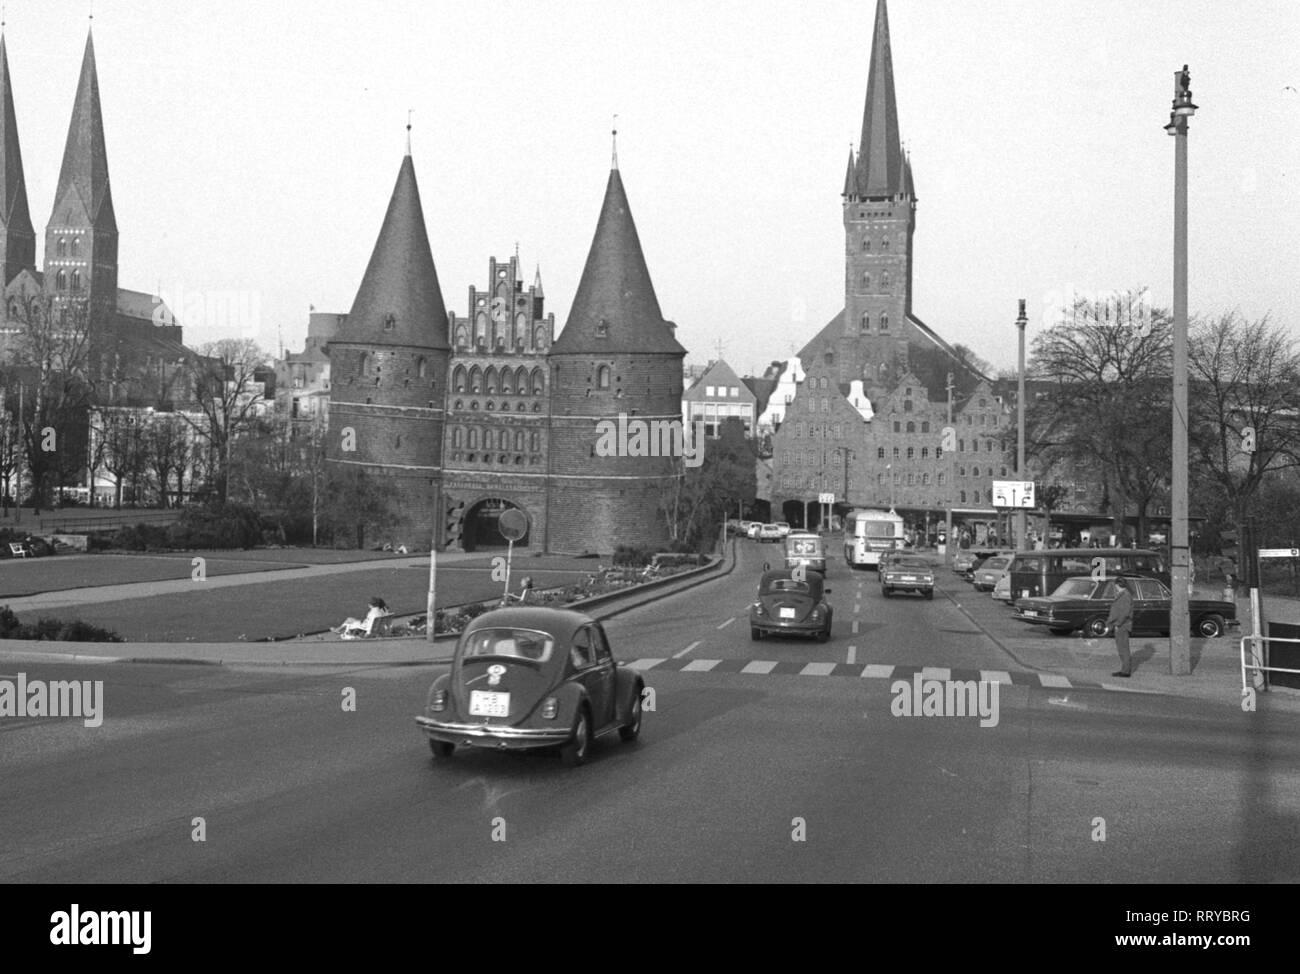 VW Beetle - VW Käfer unterwegs - Holstentor in Lübeck  -  IV - Stock Image